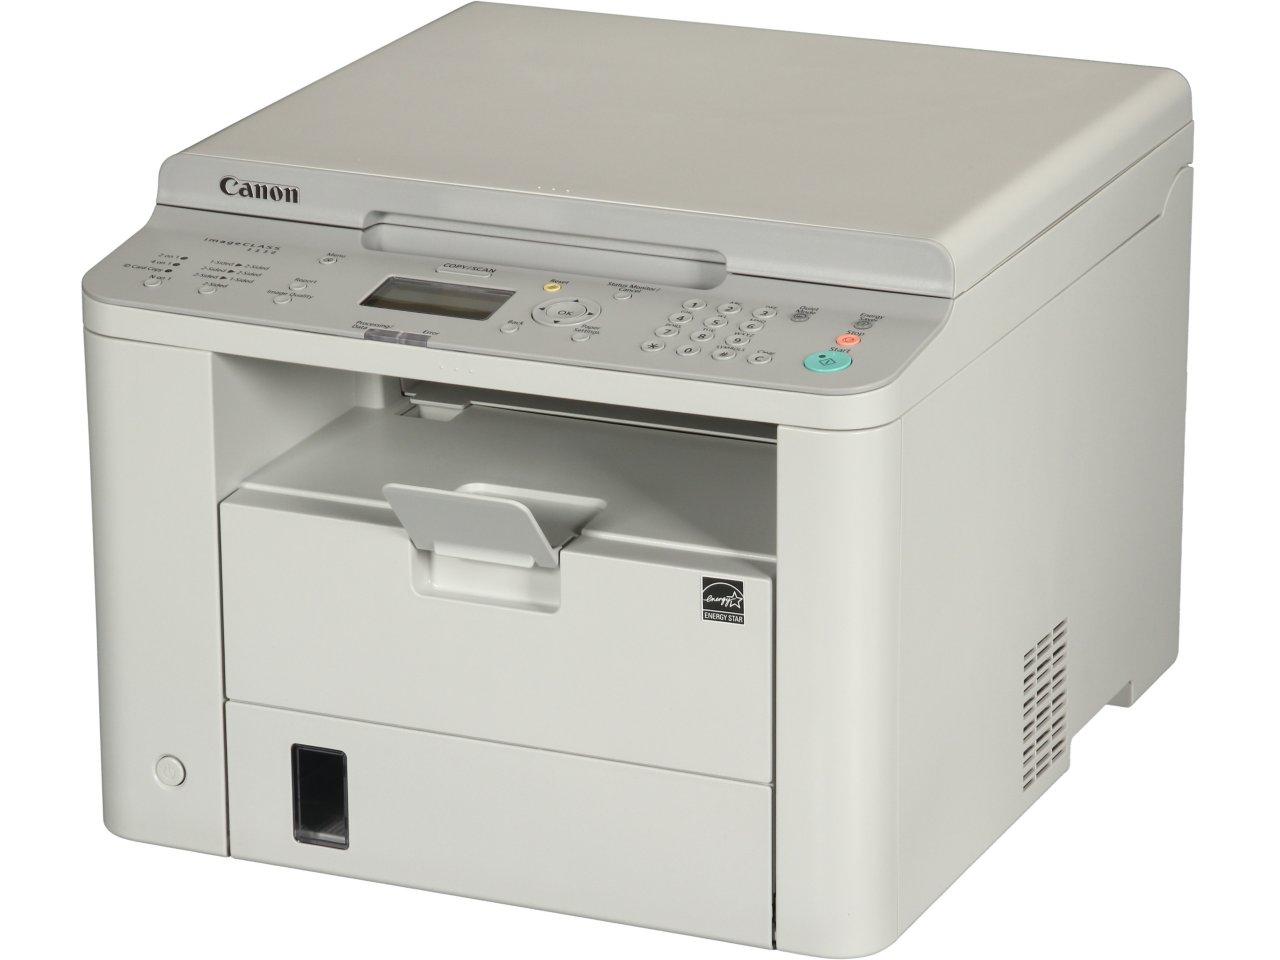 Canon imageCLASS D530 Monochrome Laser Printer w/ Scanner & Copier + $15.00 Newegg Gift Card for $84.15 AC + Free Shipping @ Newegg.com